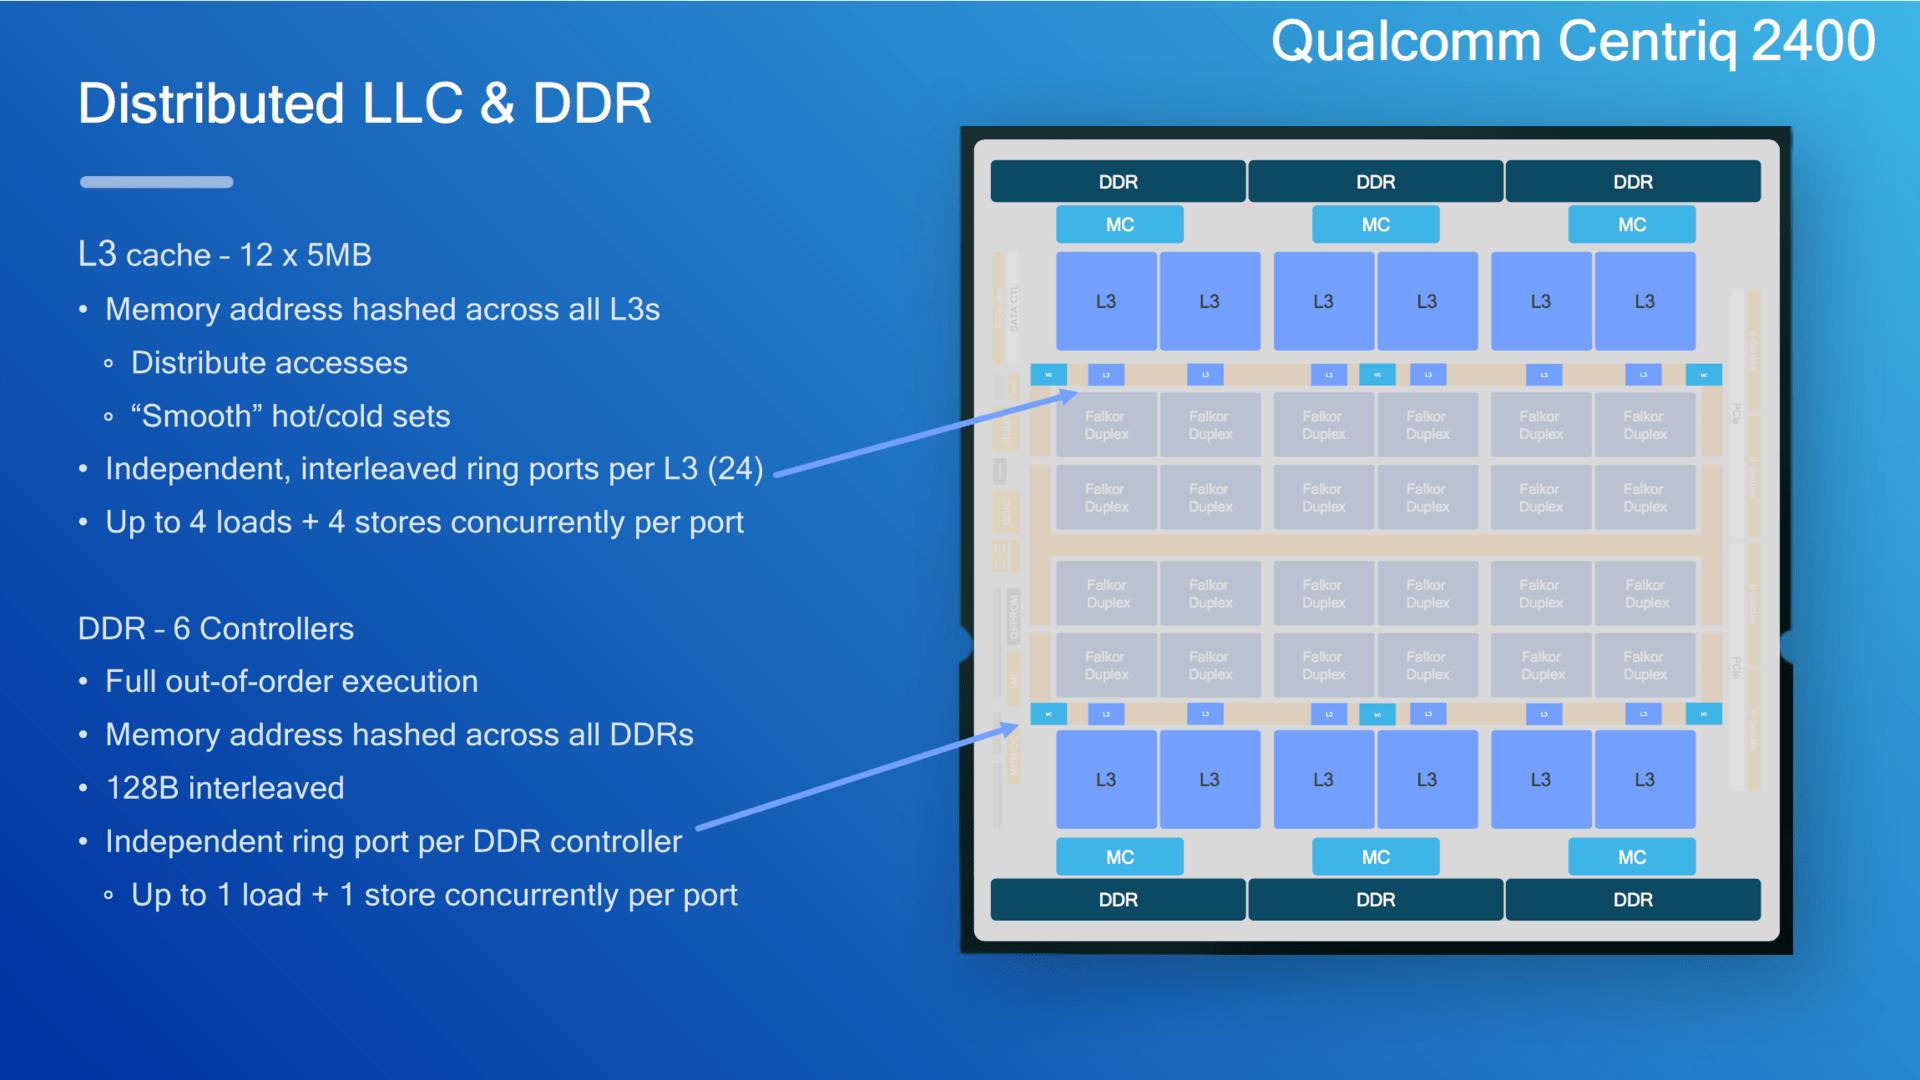 Qualcomm L2 LAN Update